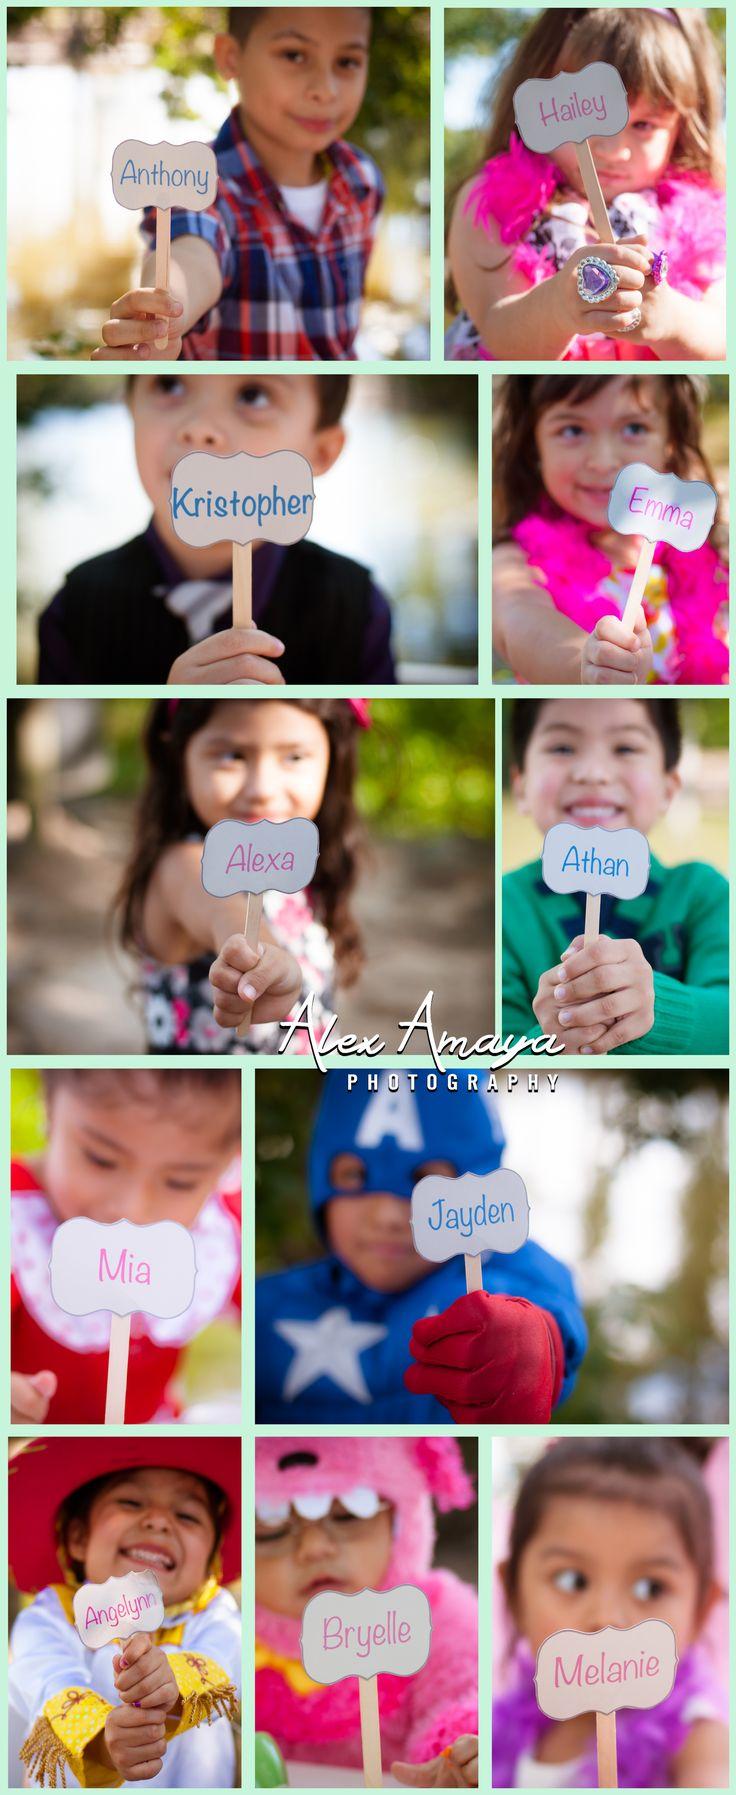 alexamayaphotography.com Family Pictures Ideas, Cousins. Tea party Costume Party